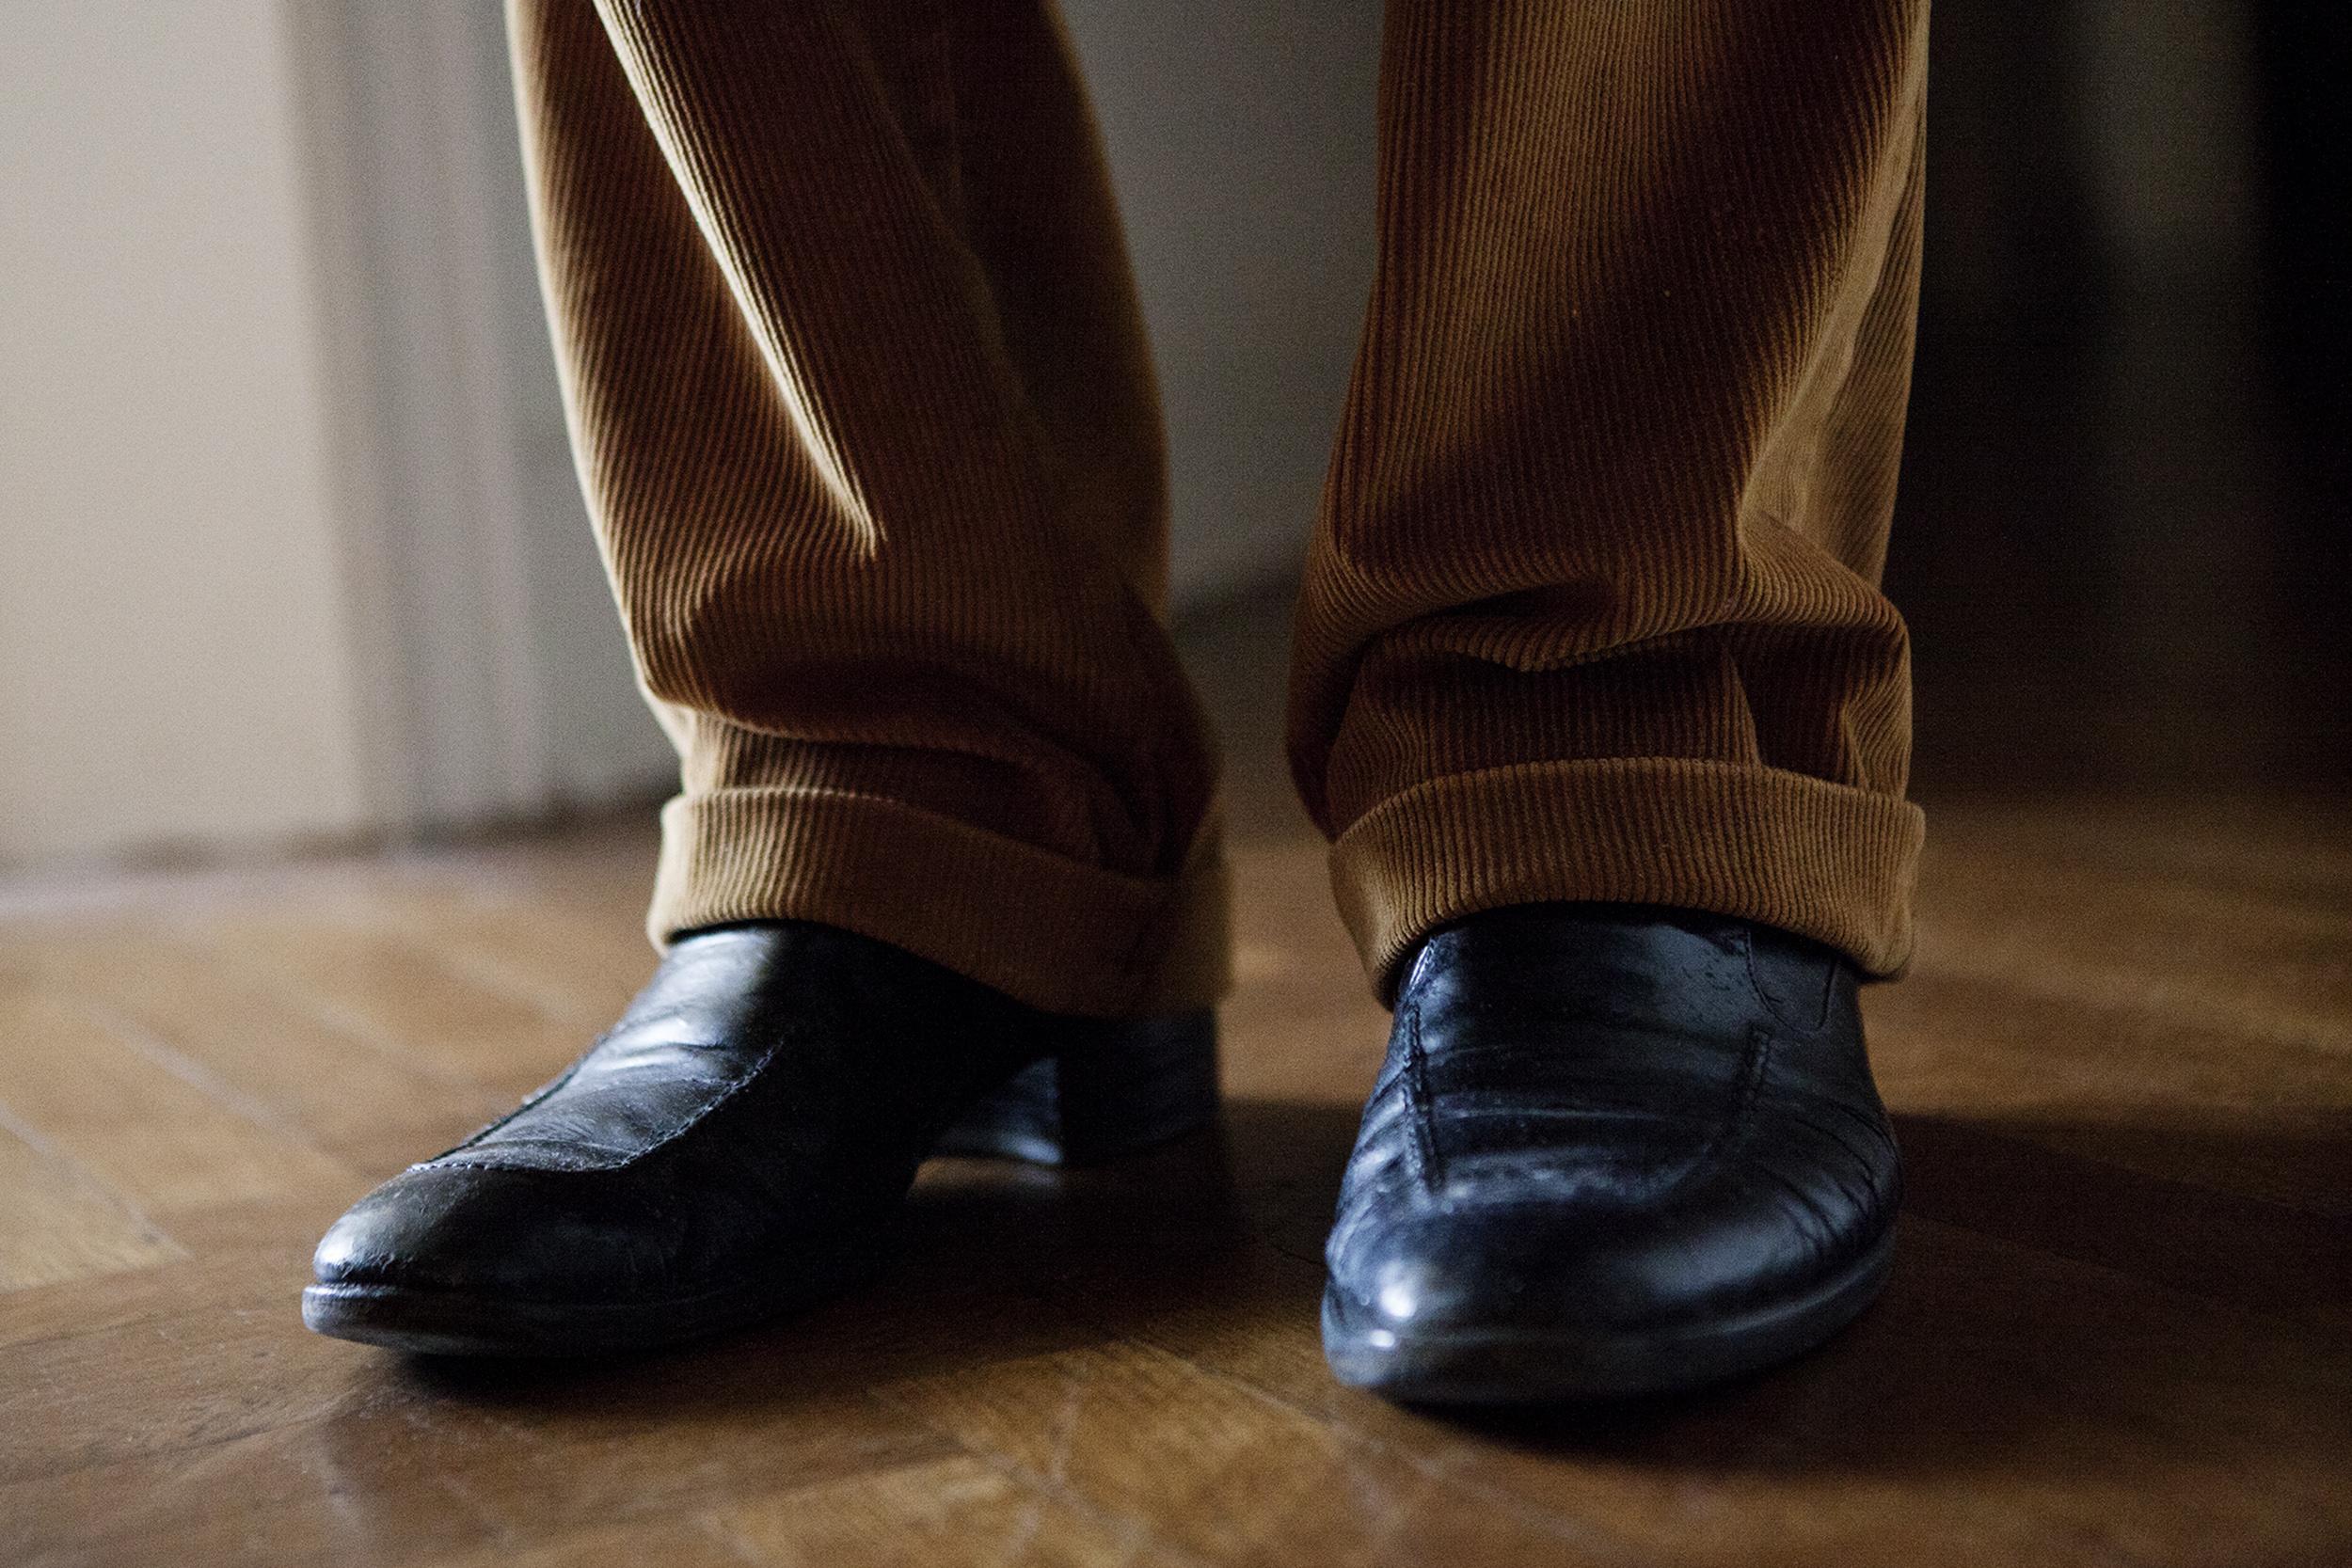 25.Eric's_shoes.jpg